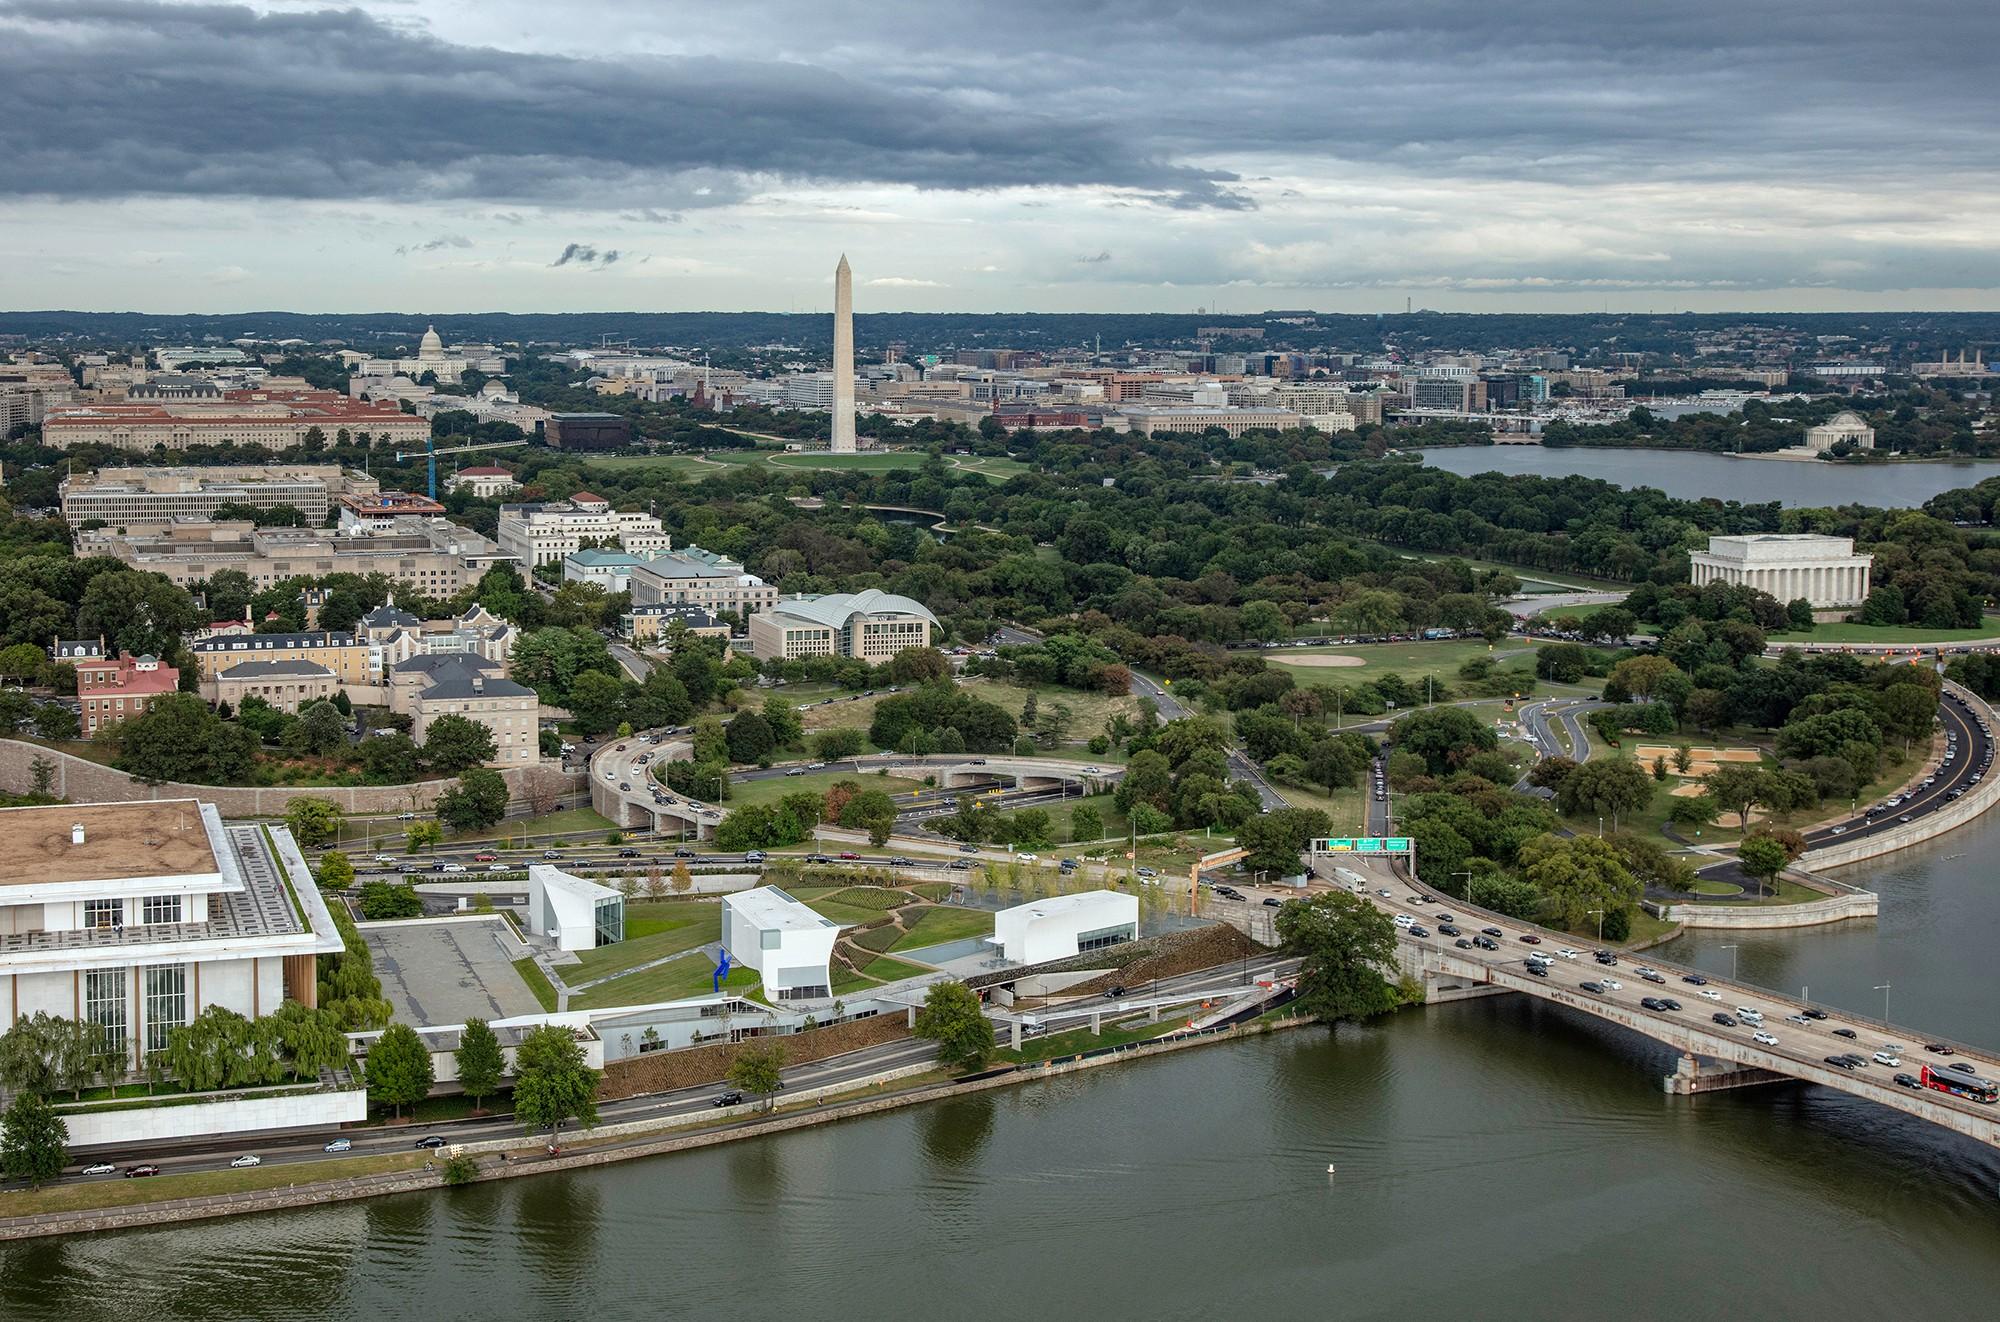 https://stevenholl.sfo2.digitaloceanspaces.com/uploads/projects/project-images/01-JFK-Aerial.jpg